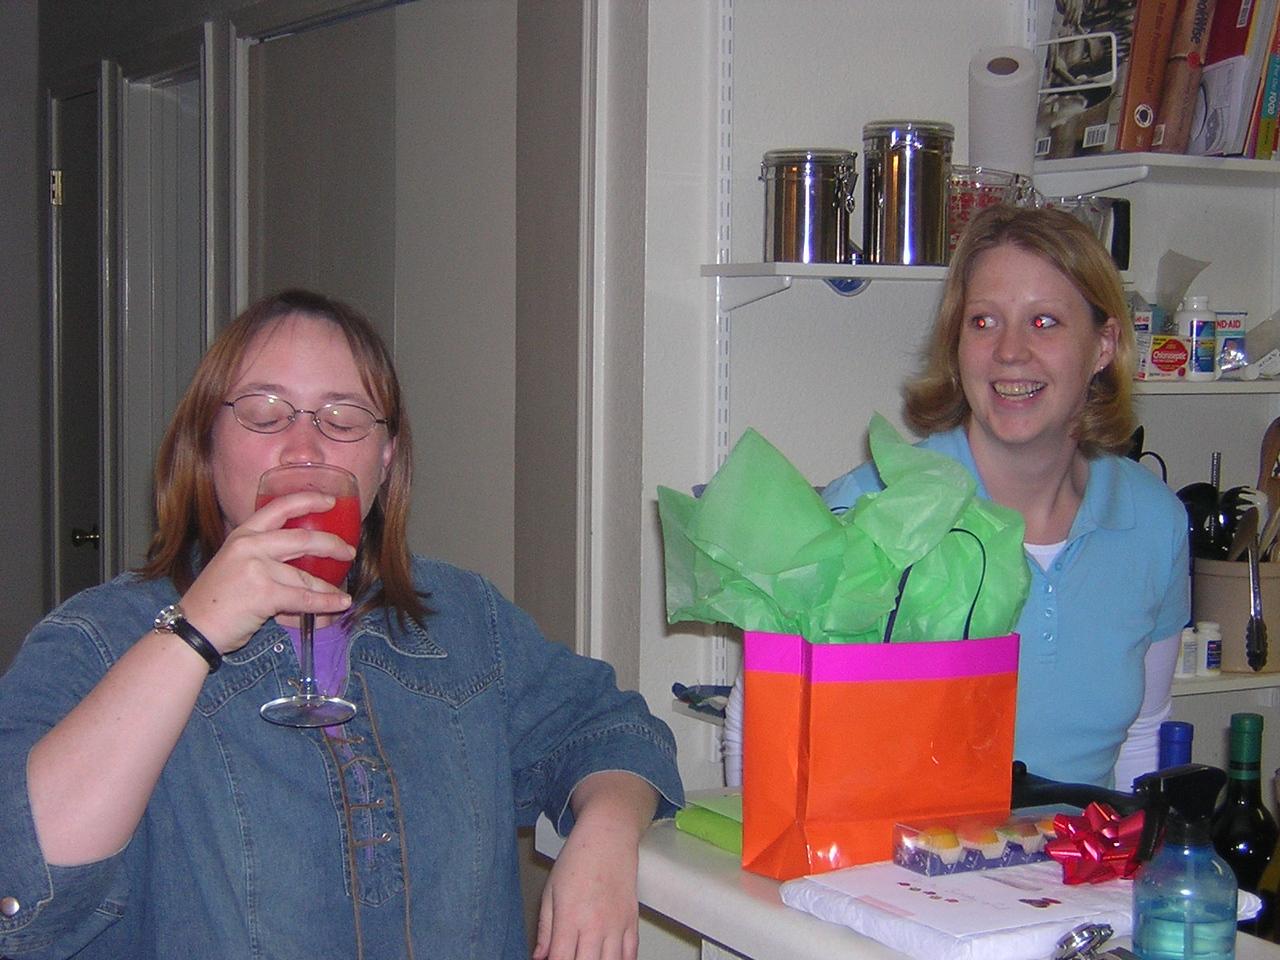 Saturday, April 23, 2005  10:13PM